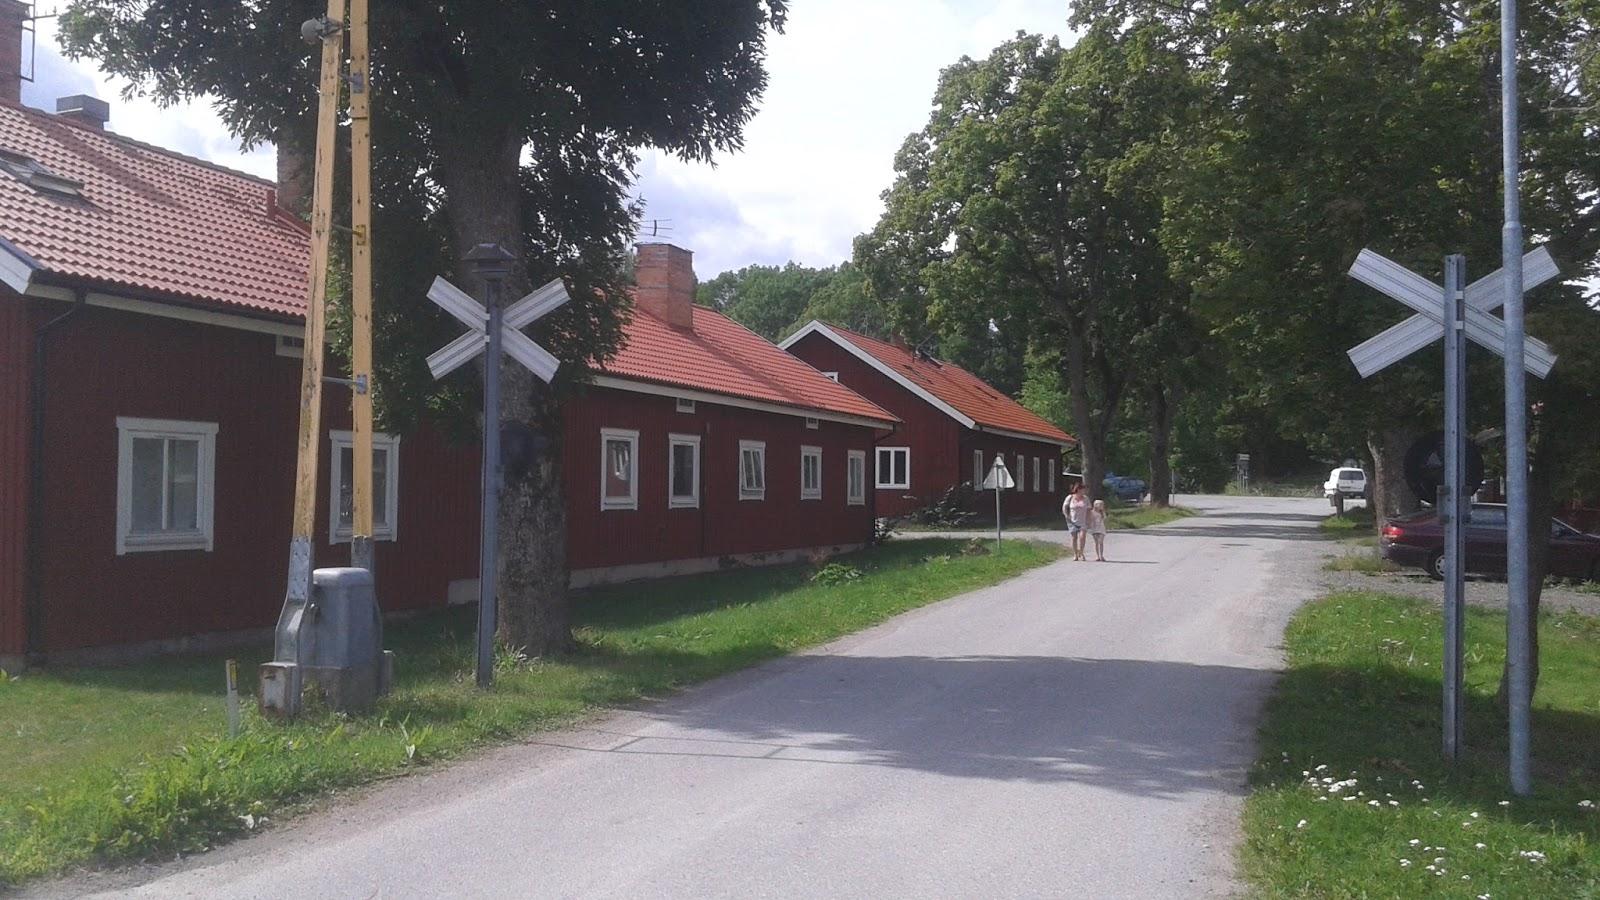 Hyra stuga/semesterhus - ker Lnna - unam.net